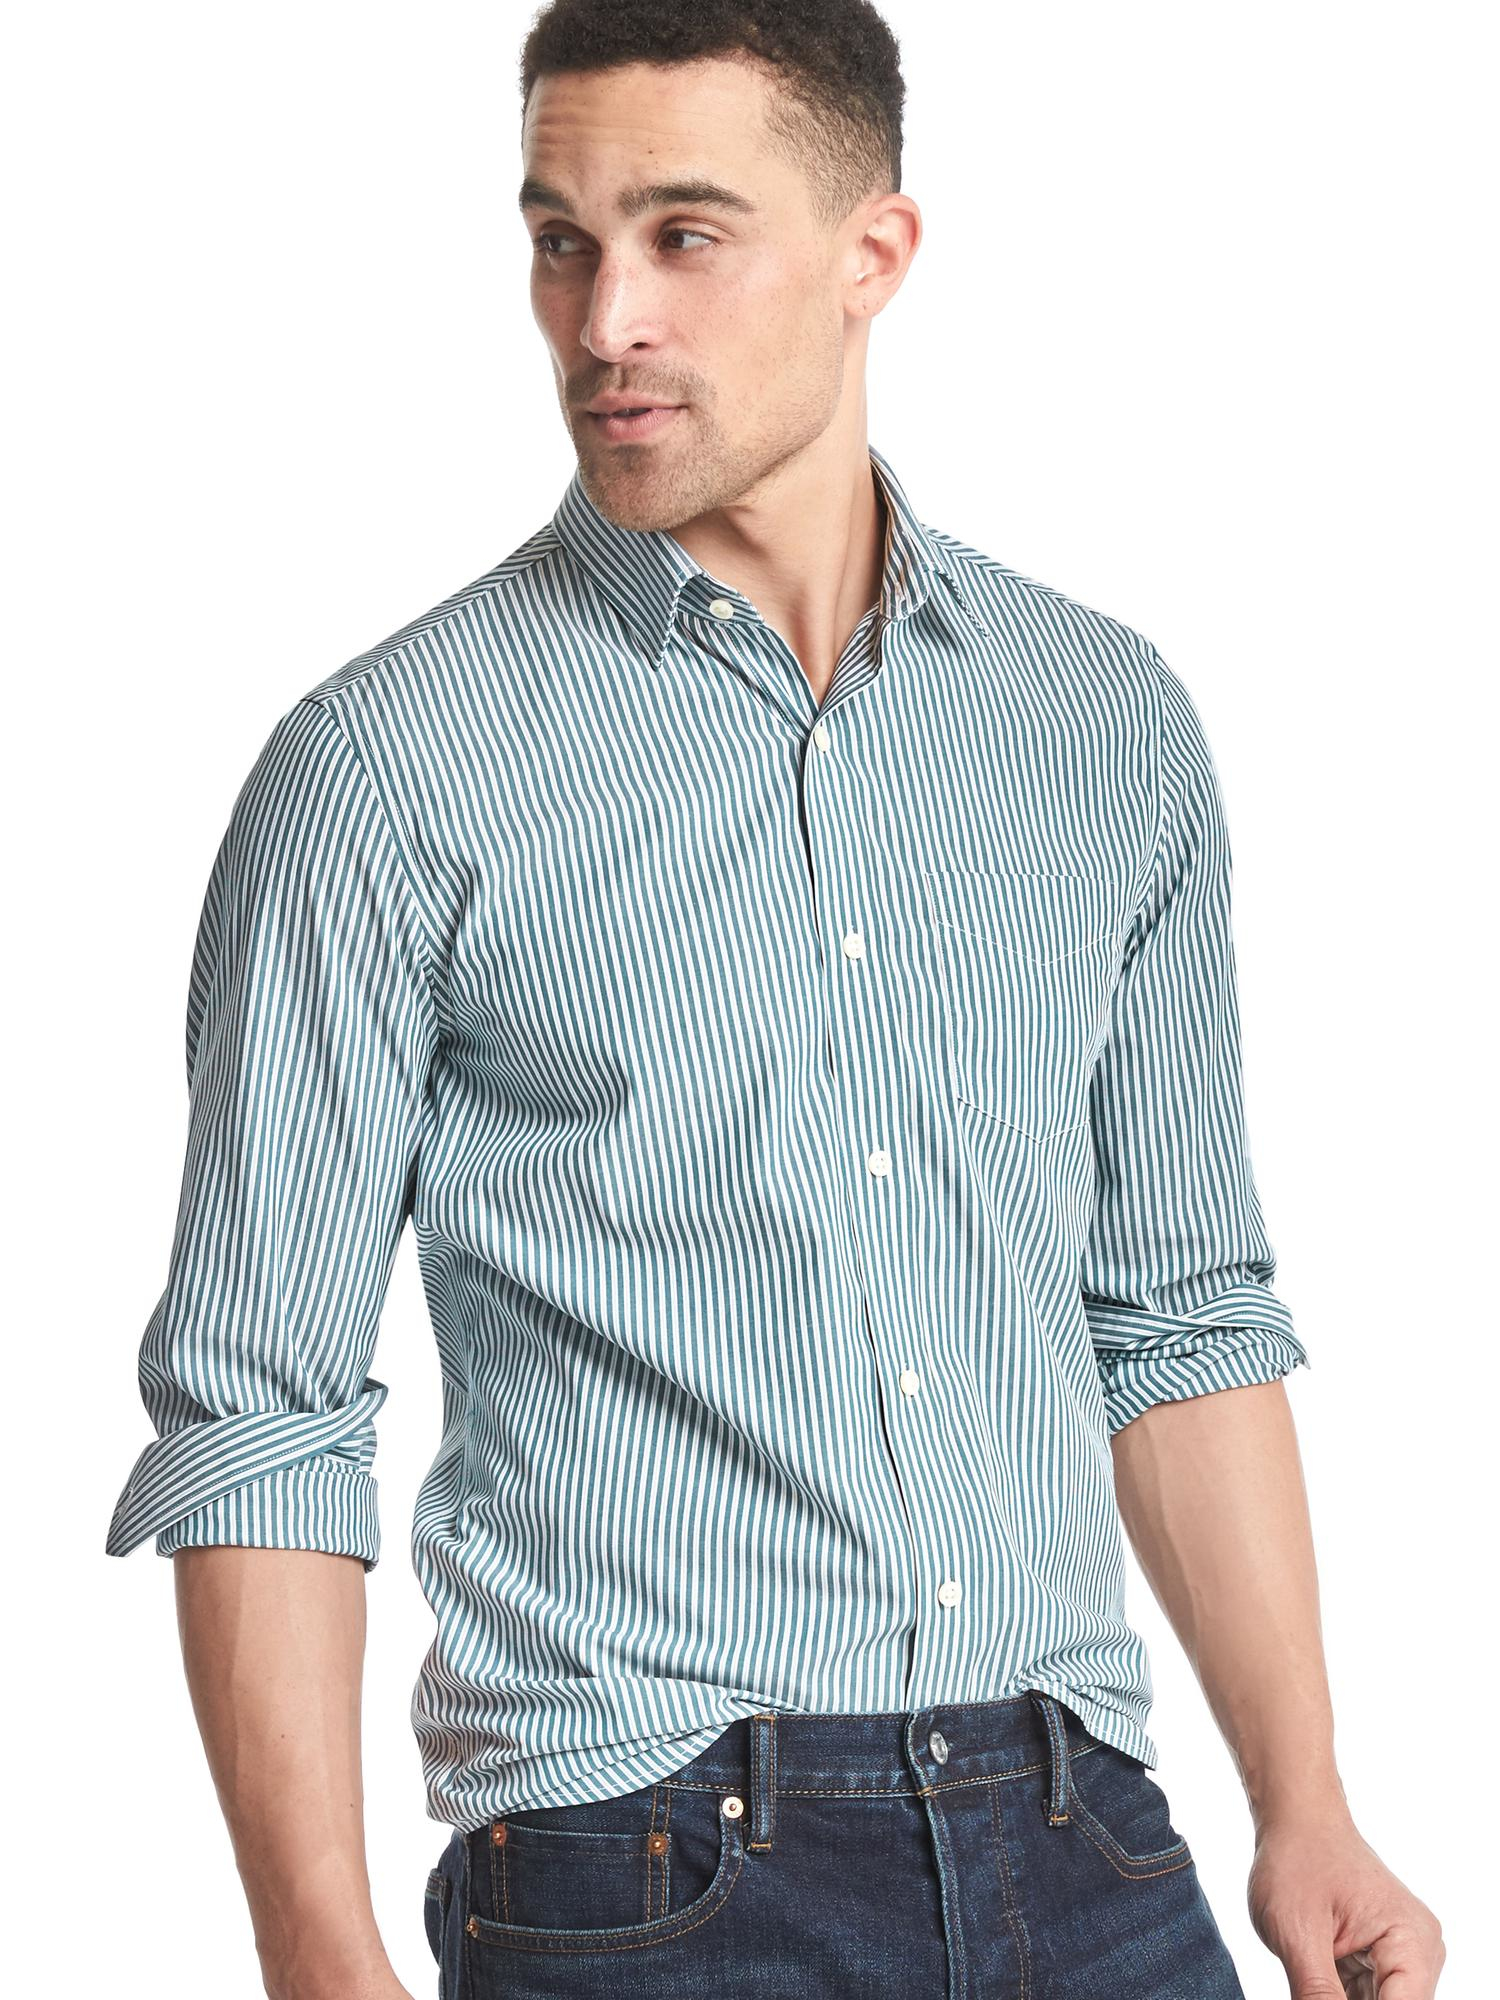 Gap wrinkle resistant stripe standard fit shirt in blue for Wrinkle resistant dress shirts